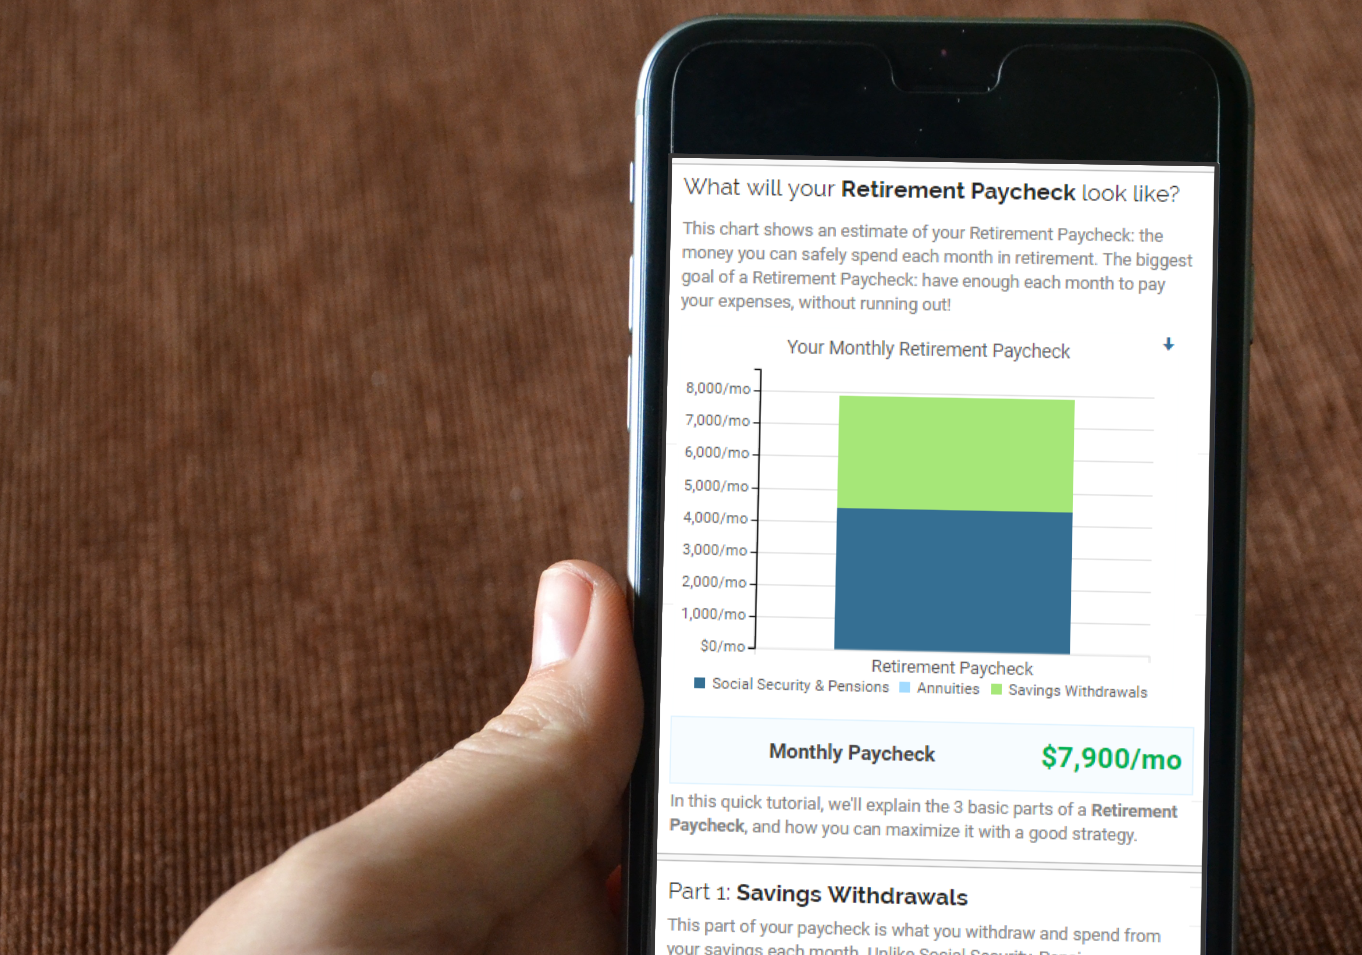 Building a Retirement Paycheck